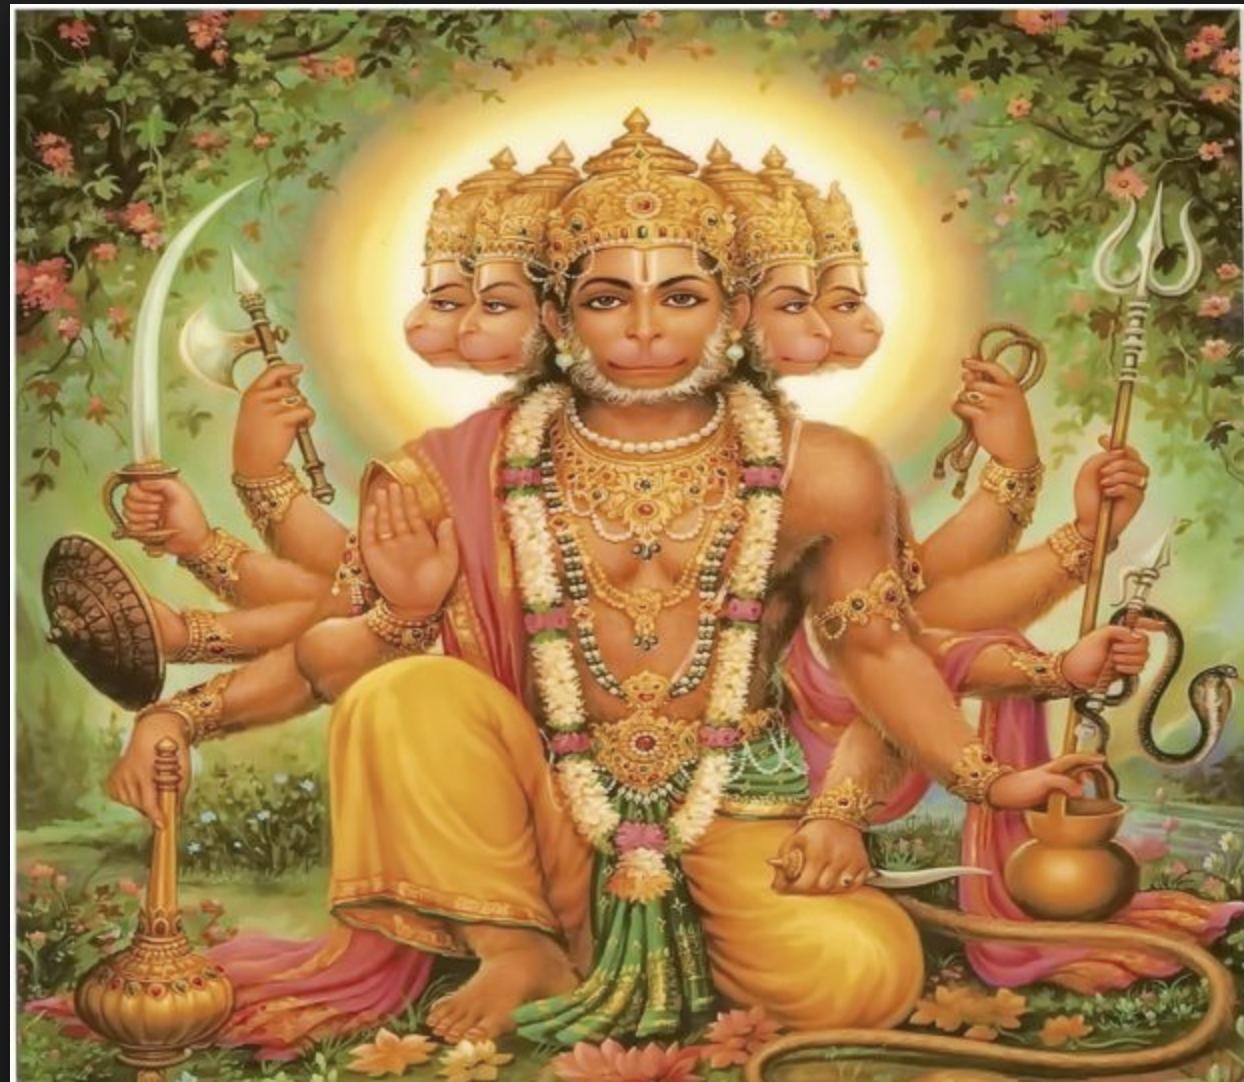 Panchmukhi Hanuman Ji Ke 12 Naam